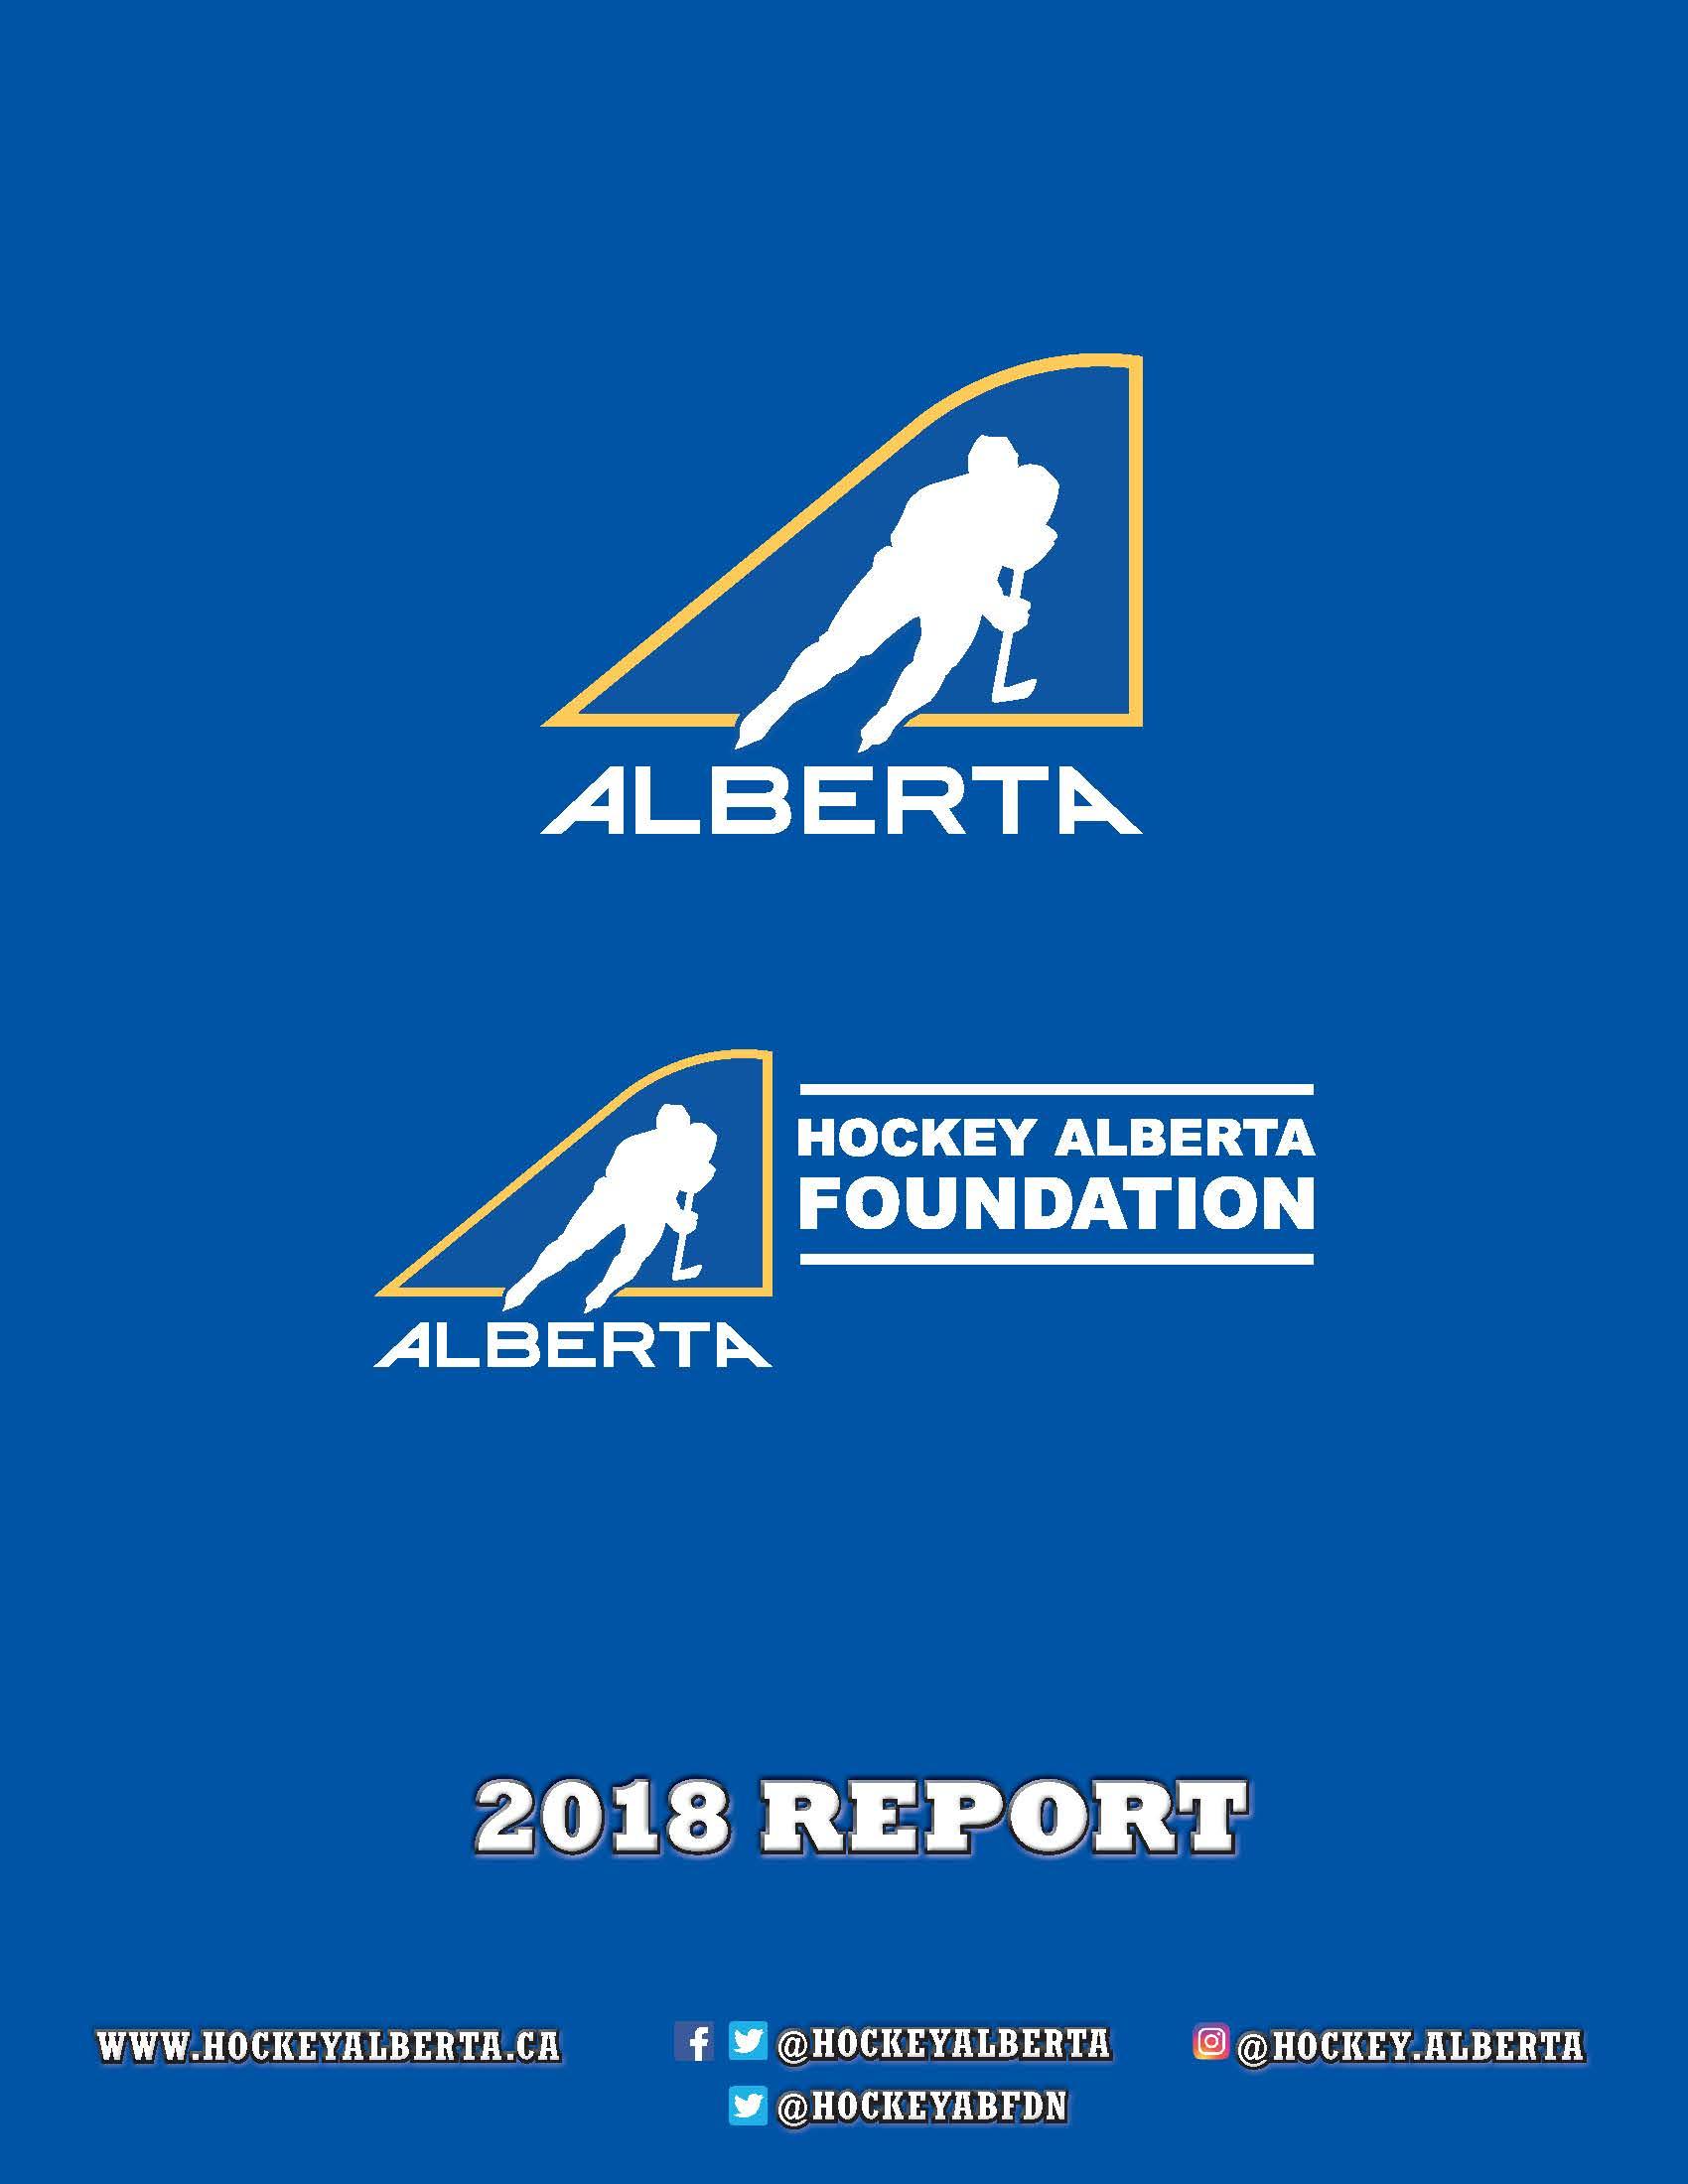 2018 Hockey Alberta Report